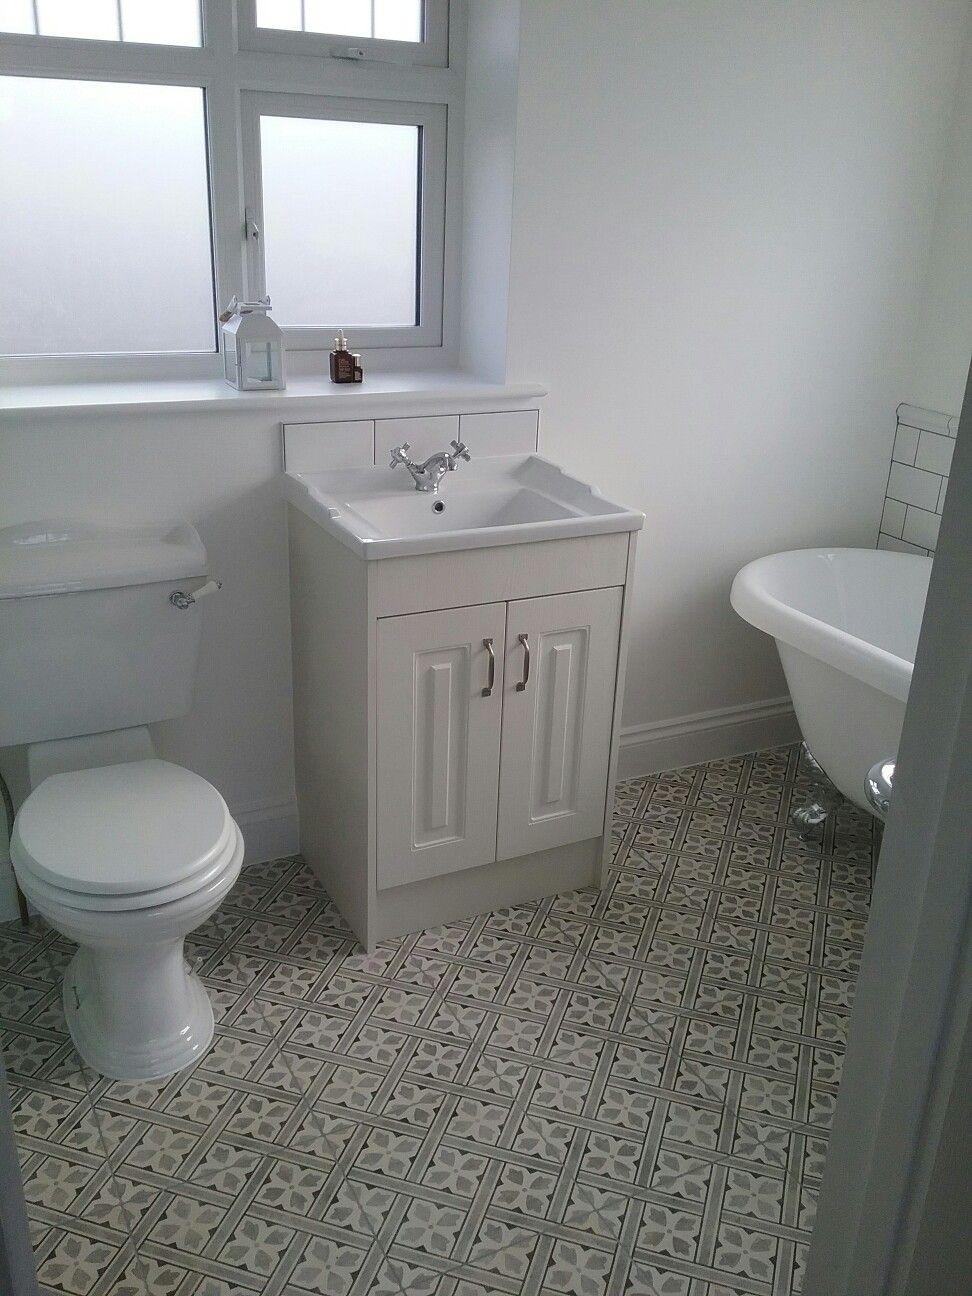 Laura ashley mr jones tiles in charcoal and the bath co york vanity ...